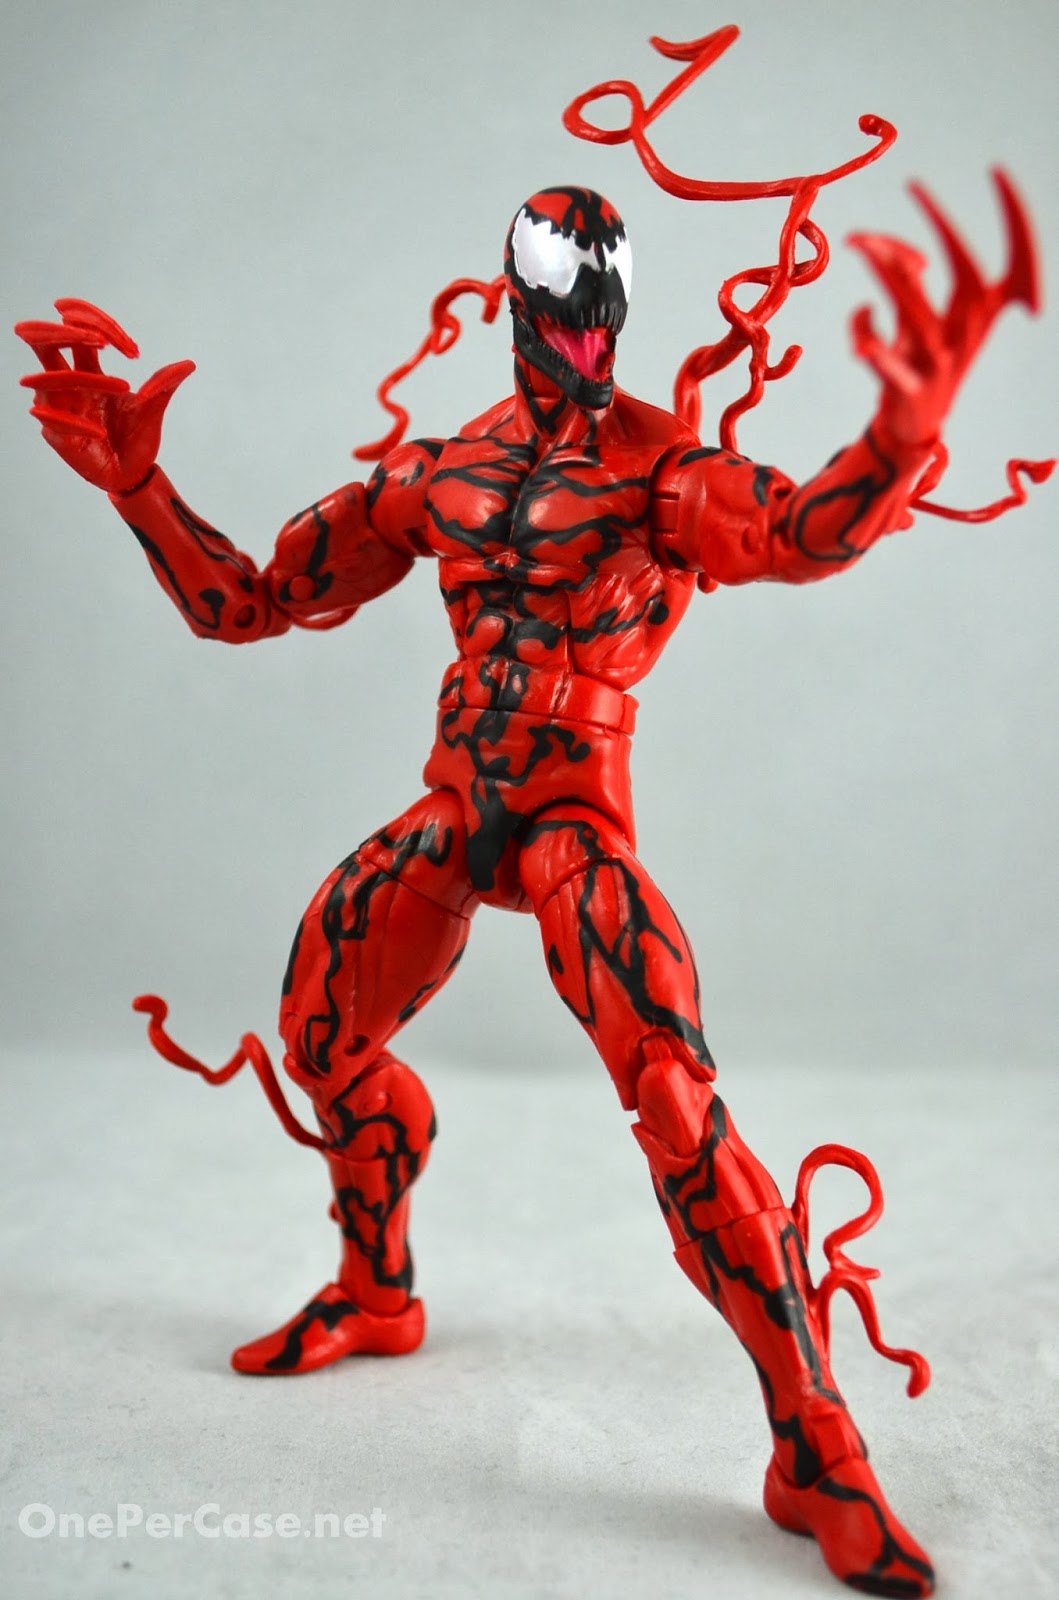 Ultimate spiderman carnage figure - photo#8